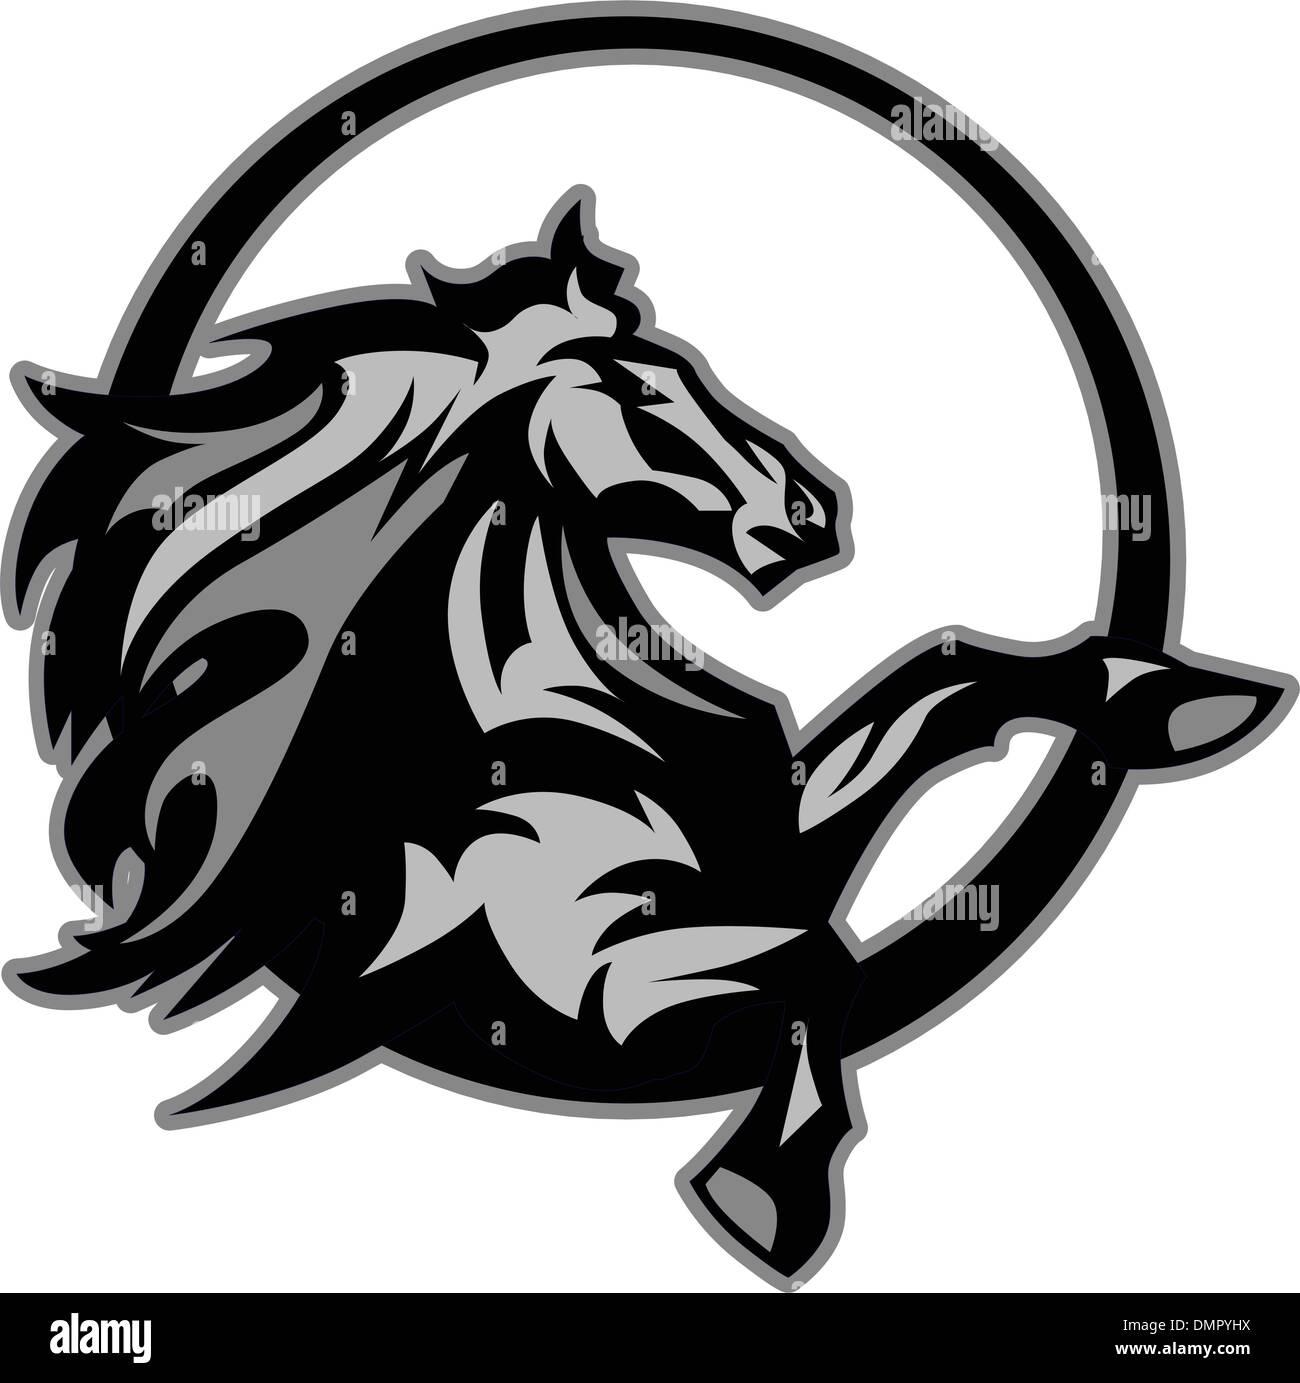 Mustang Stallion Graphic Mascot Vector Image - Stock Image